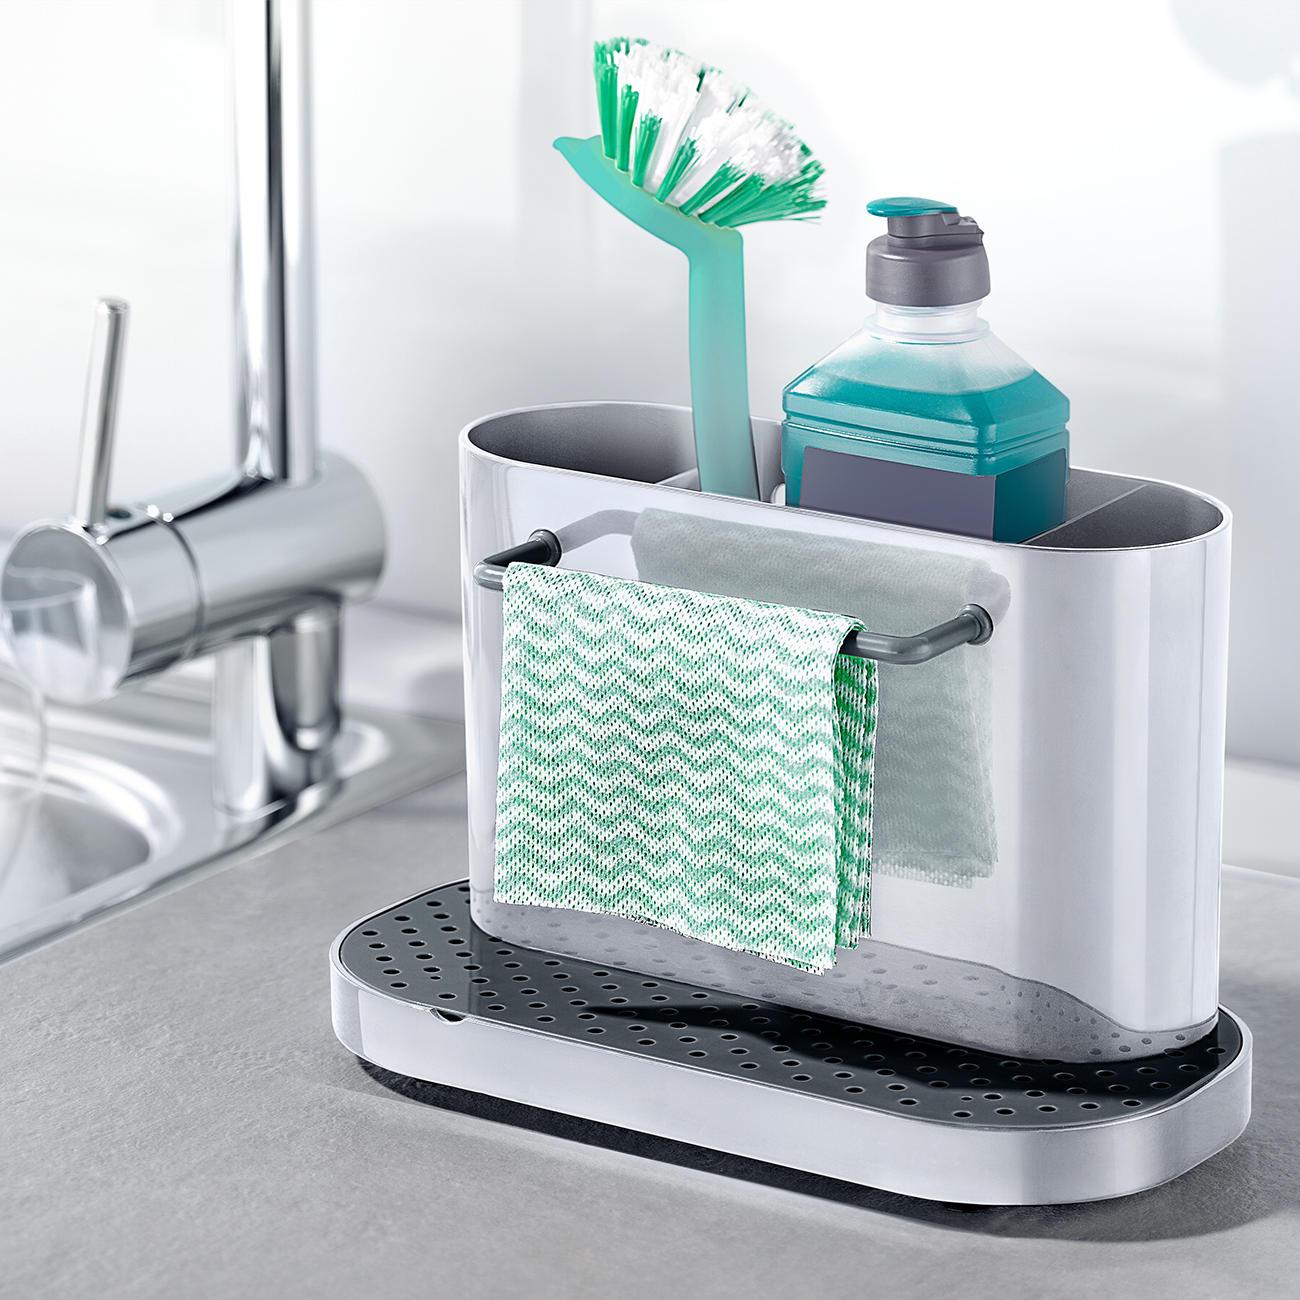 Buy Sink Caddy | 3-year product guarantee